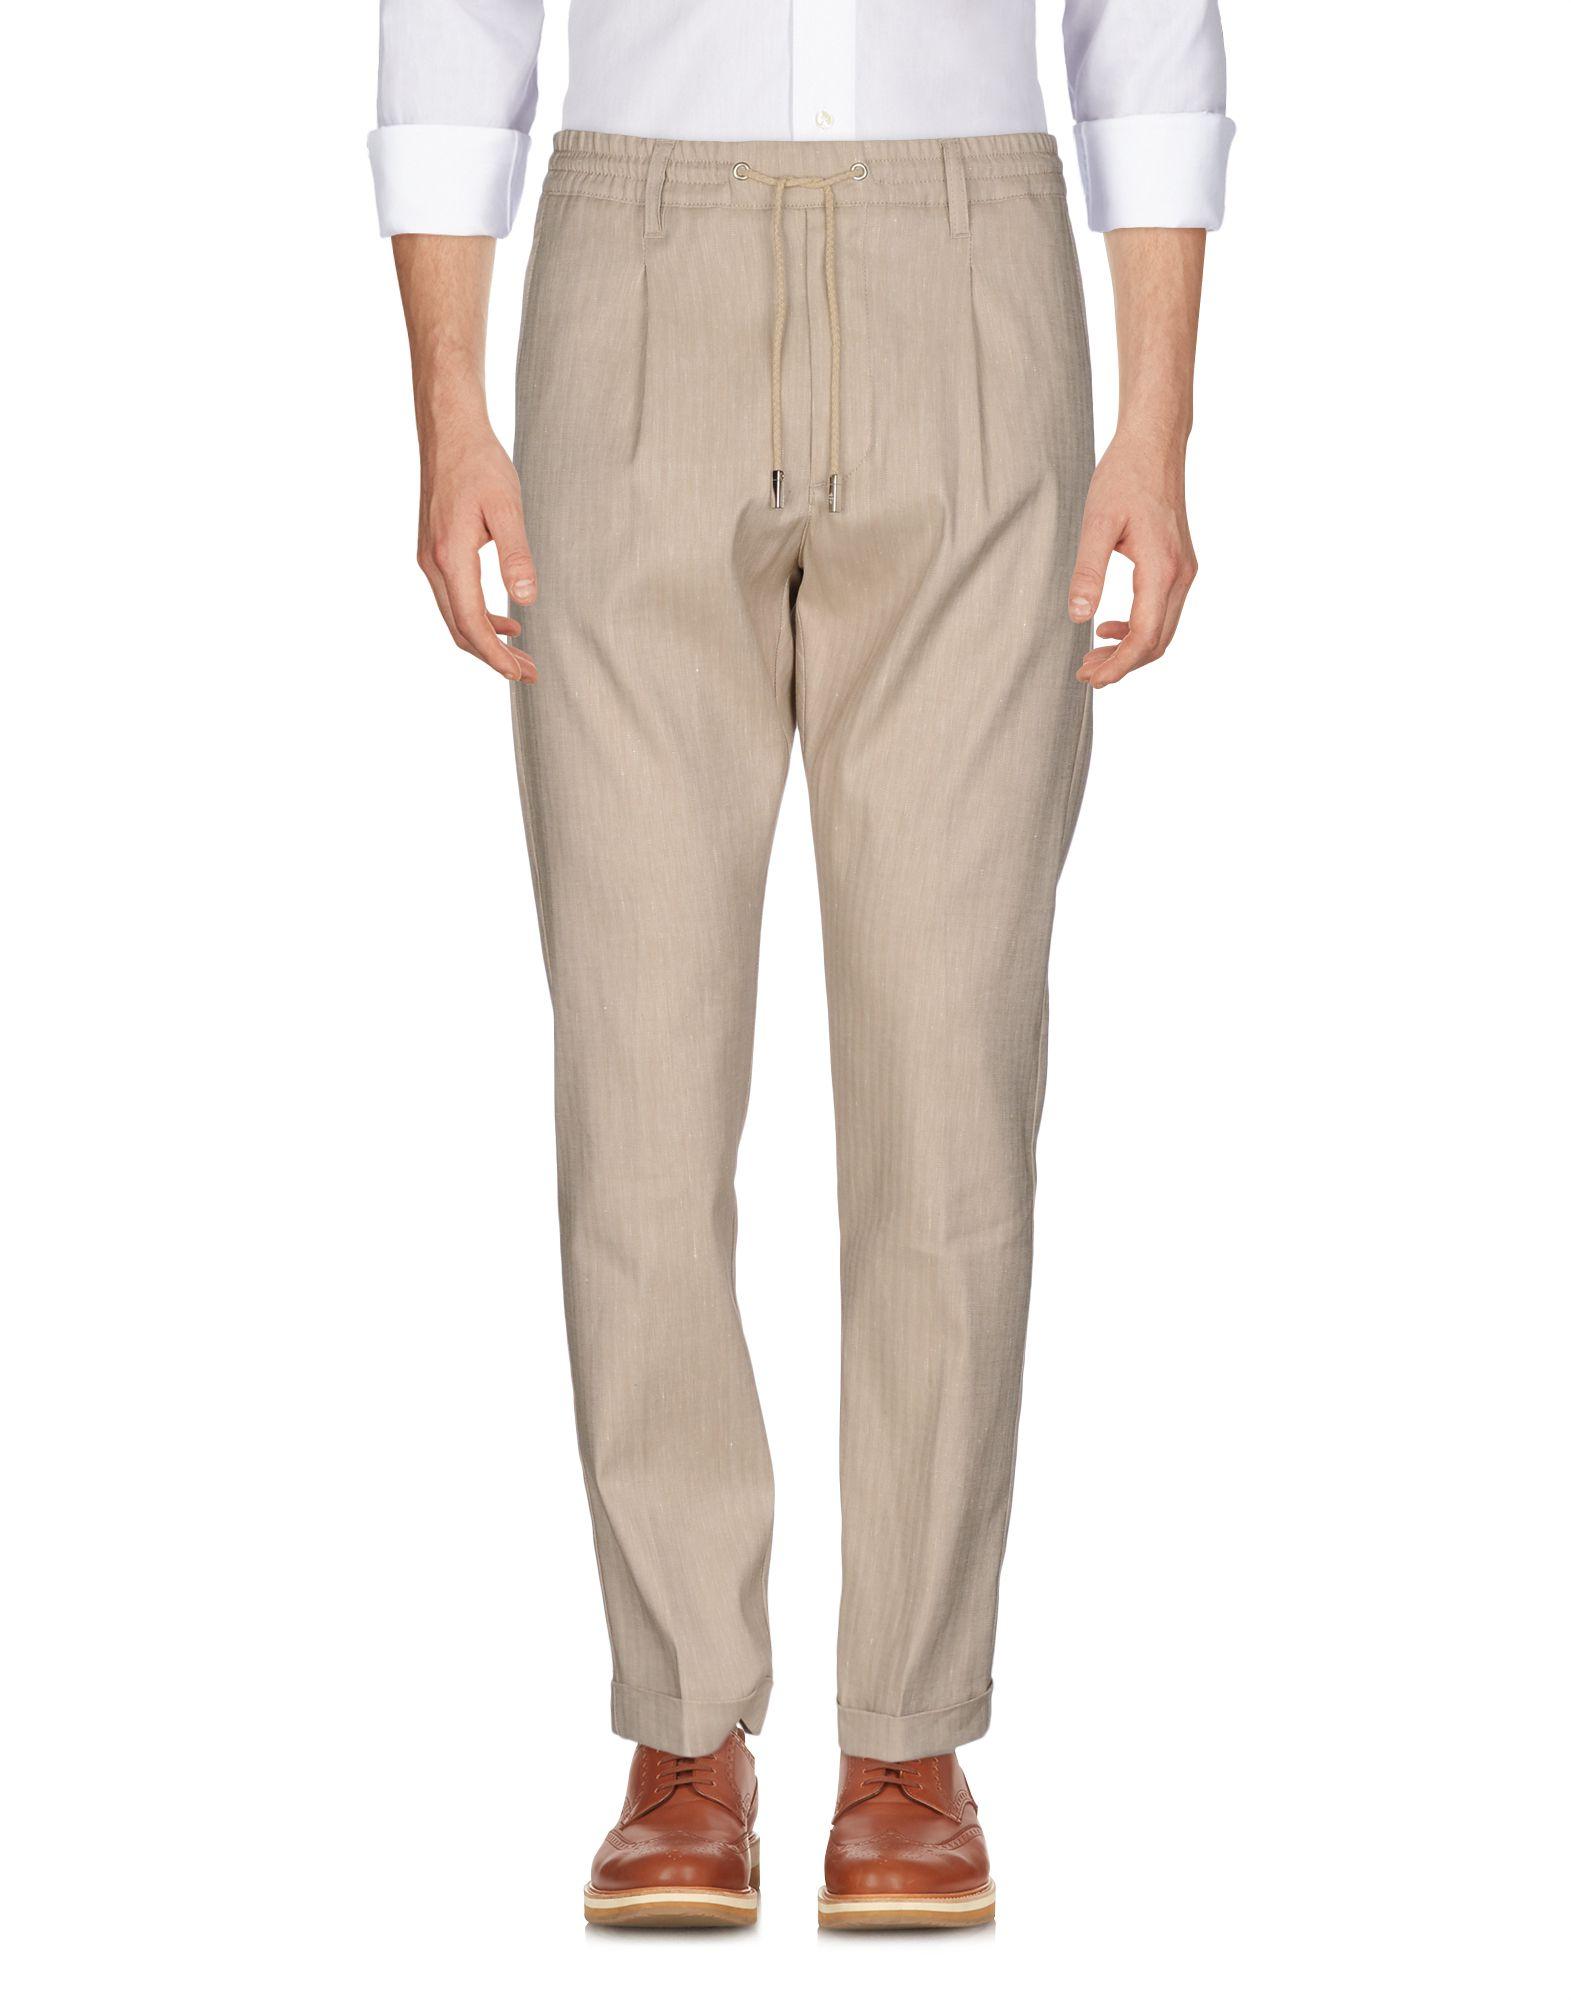 Pantalone Eleventy Uomo - Acquista online su